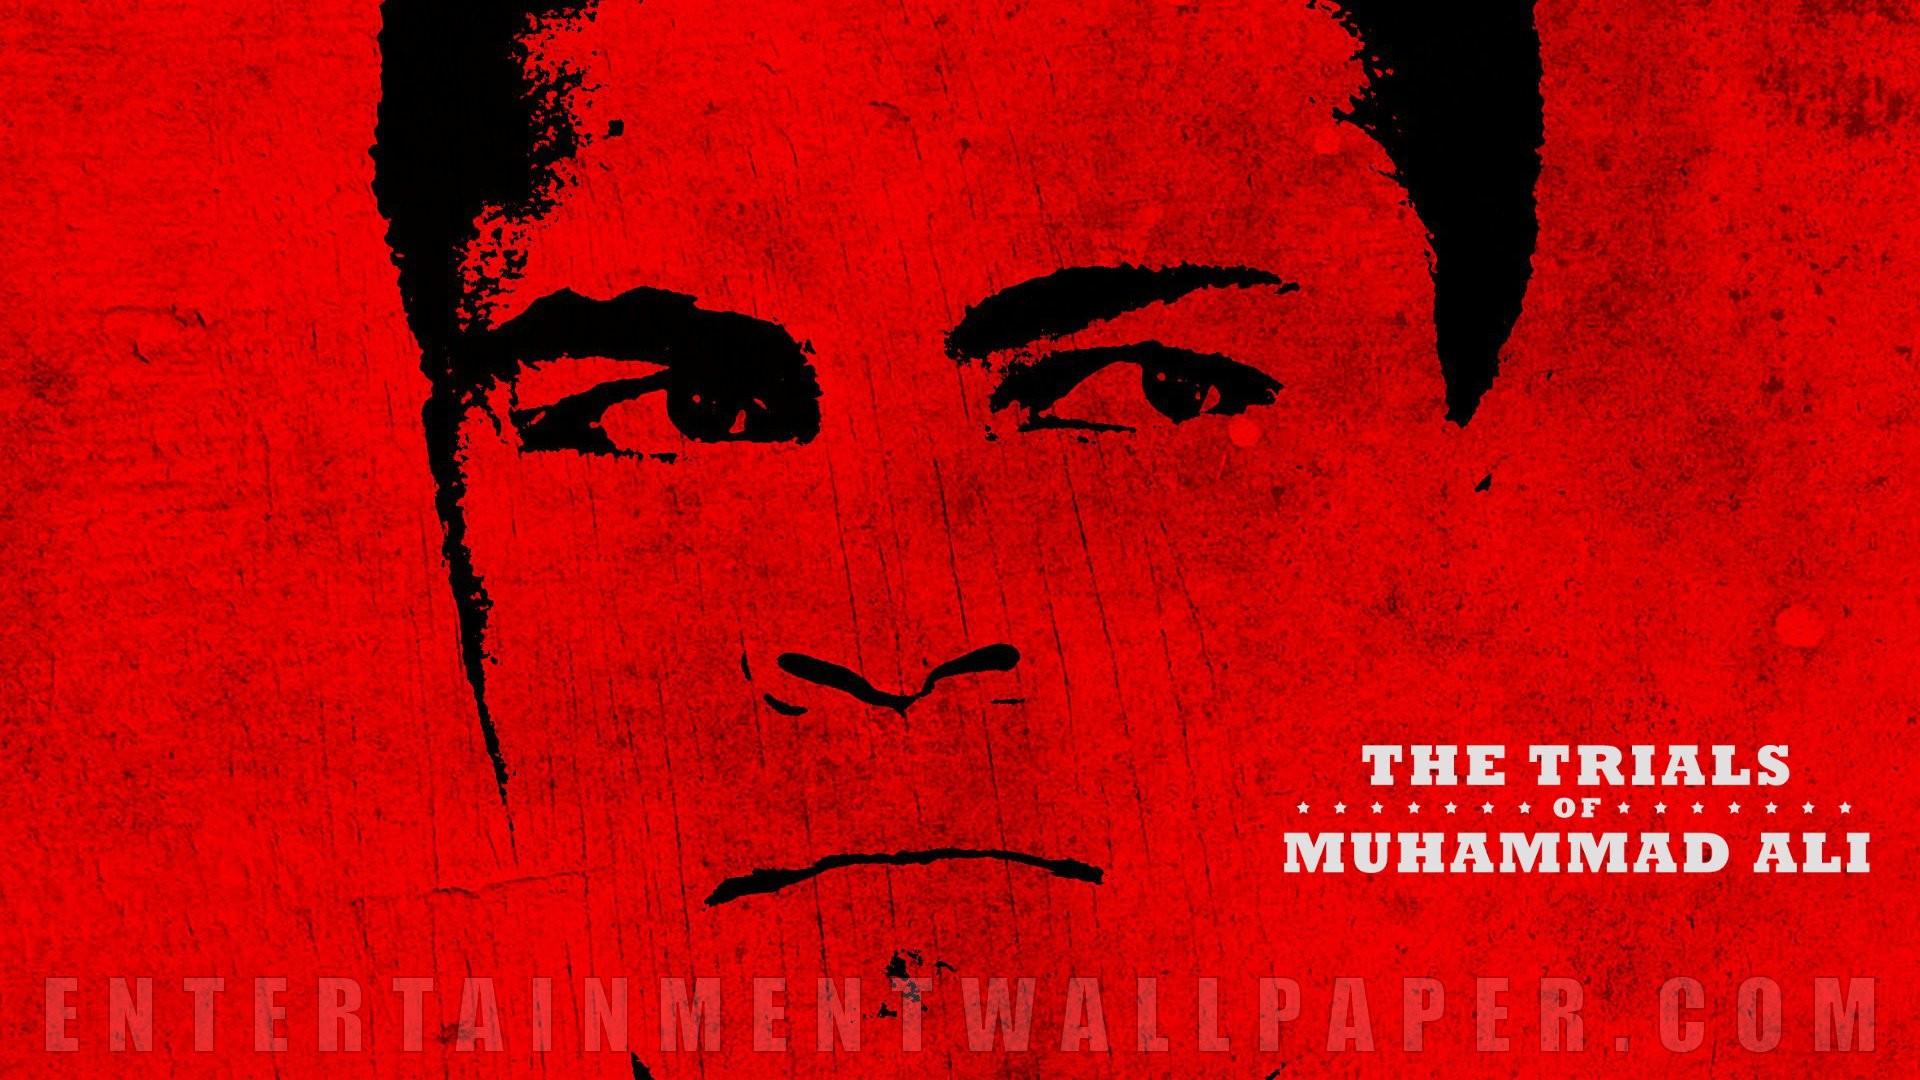 The Trials of Muhammad Ali Wallpaper – Original size, download now.